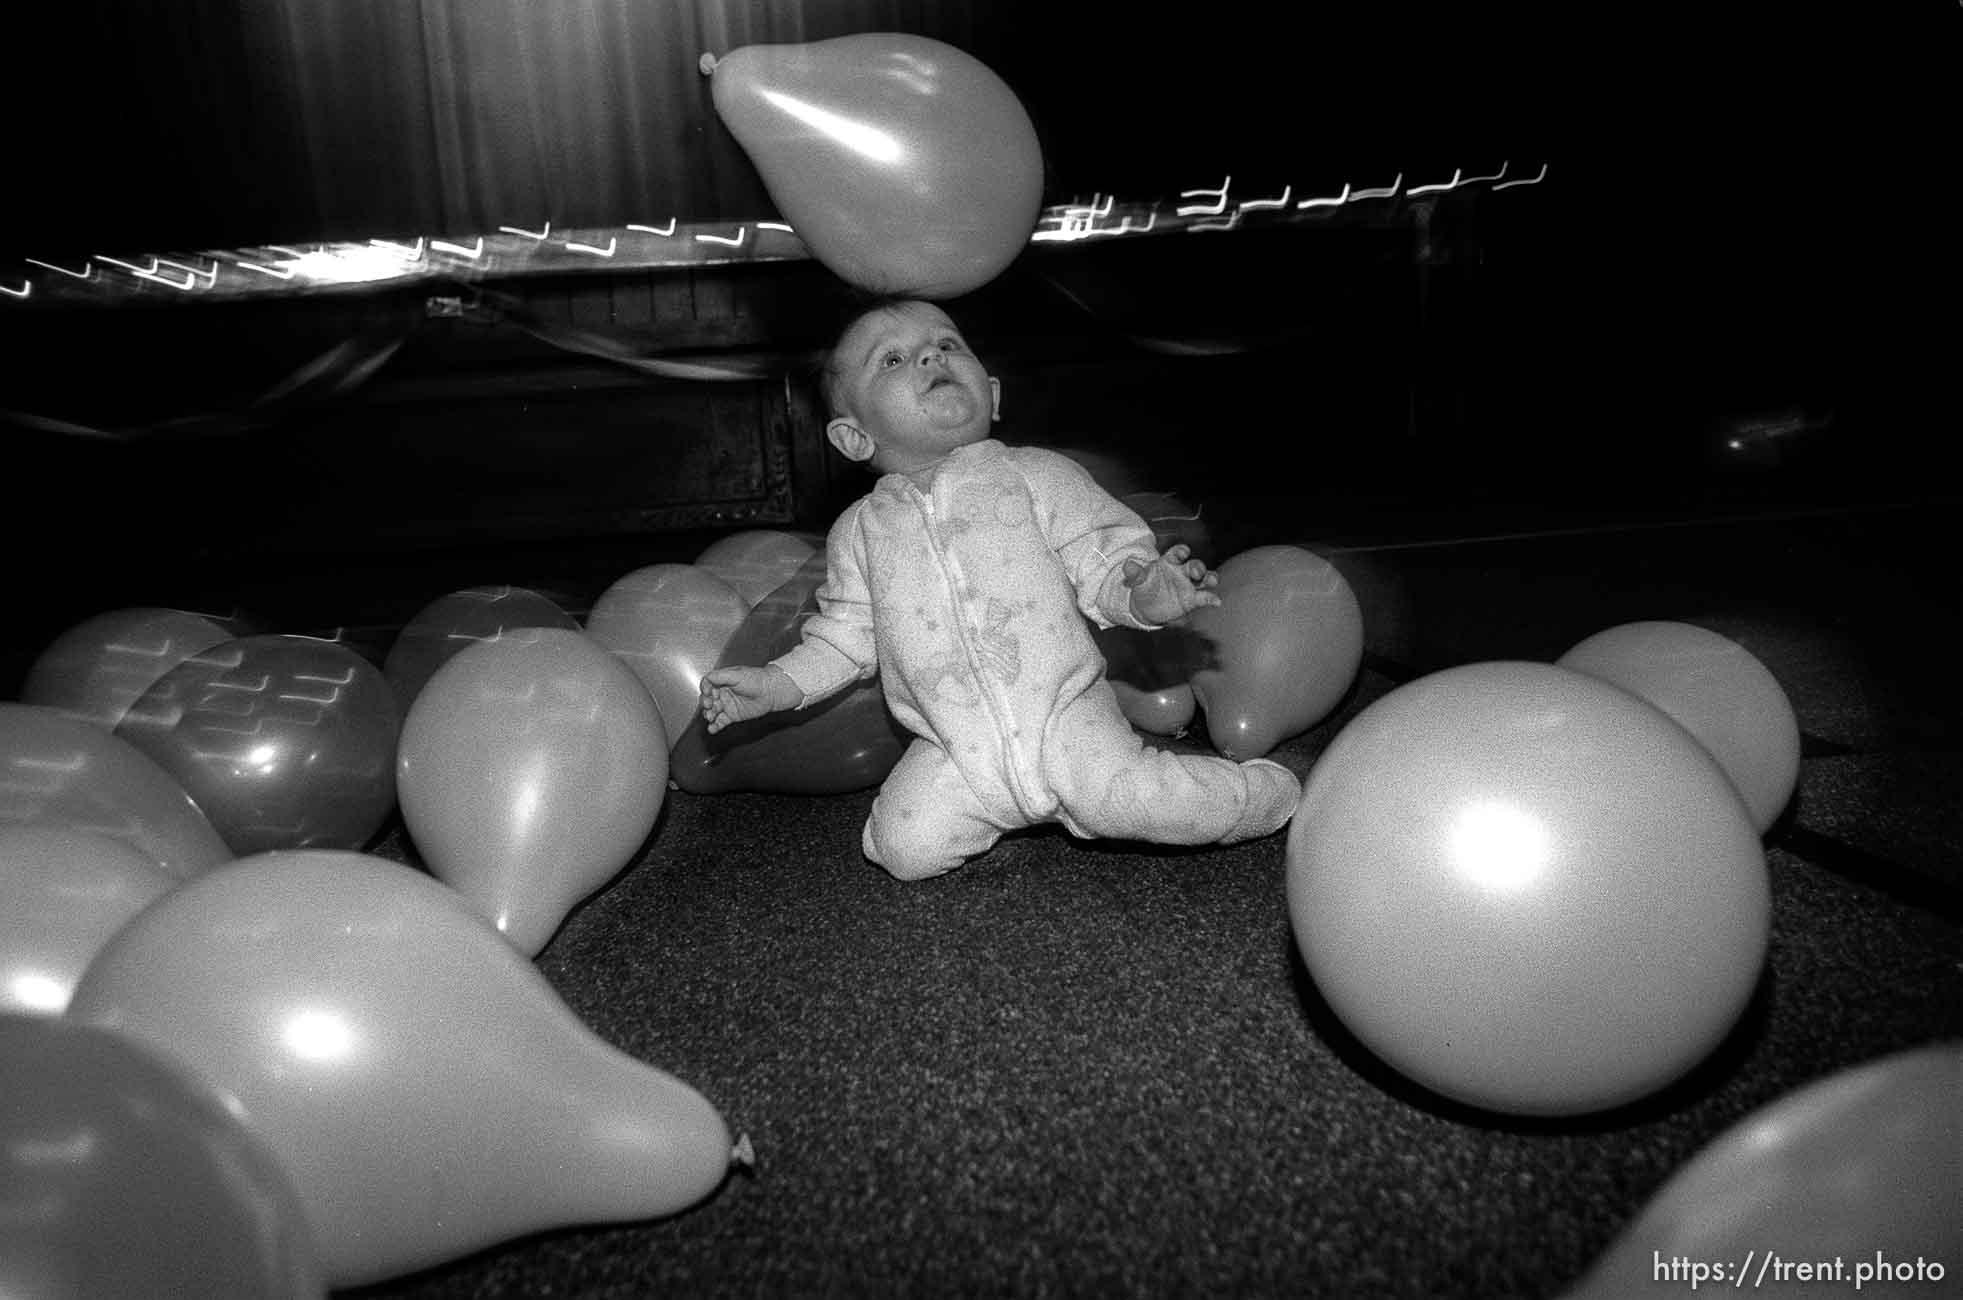 Kid with balloon on its head